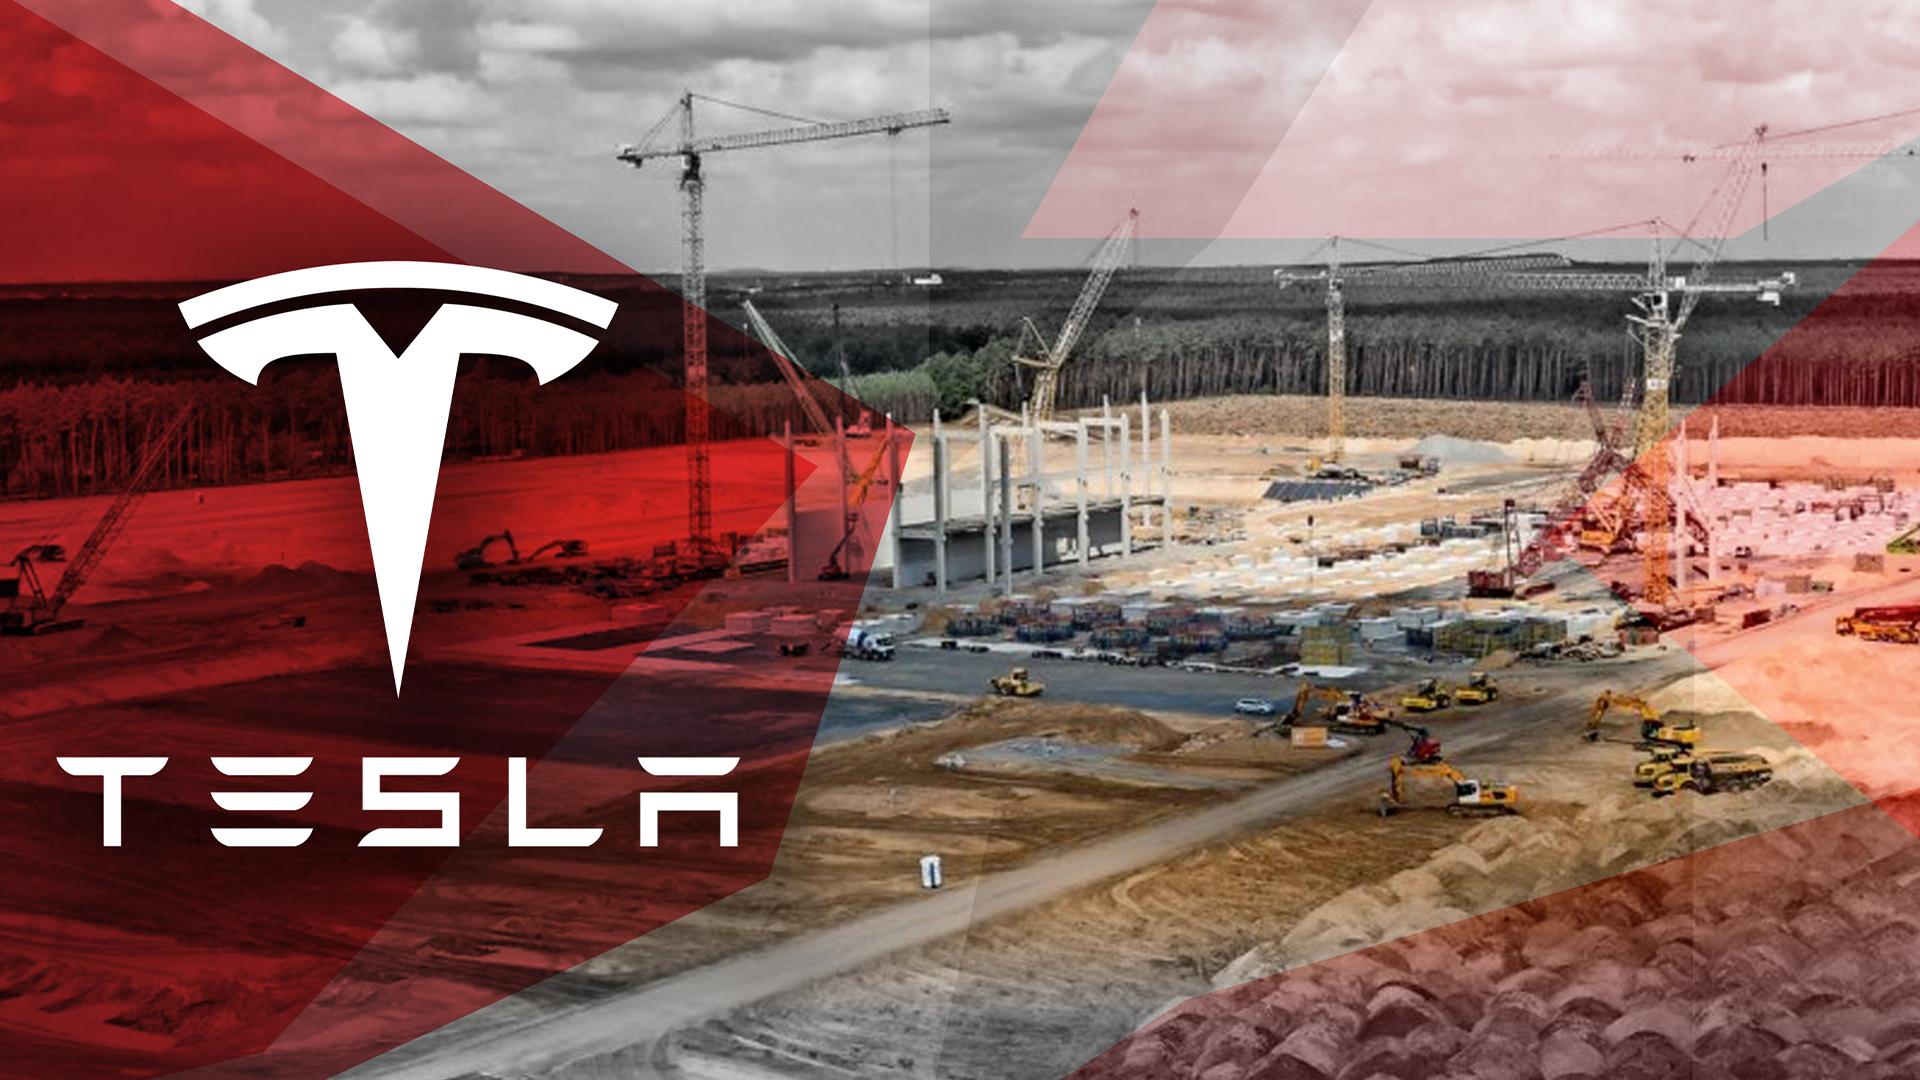 tesla, Tesla Motors, Fabrik, Gigafactory, Grünheide, Nevada, Gigafactory 4, Giga Berlin, Tesla Fabrik, Freienbrink, Tesla Brandenburg, Baustelle